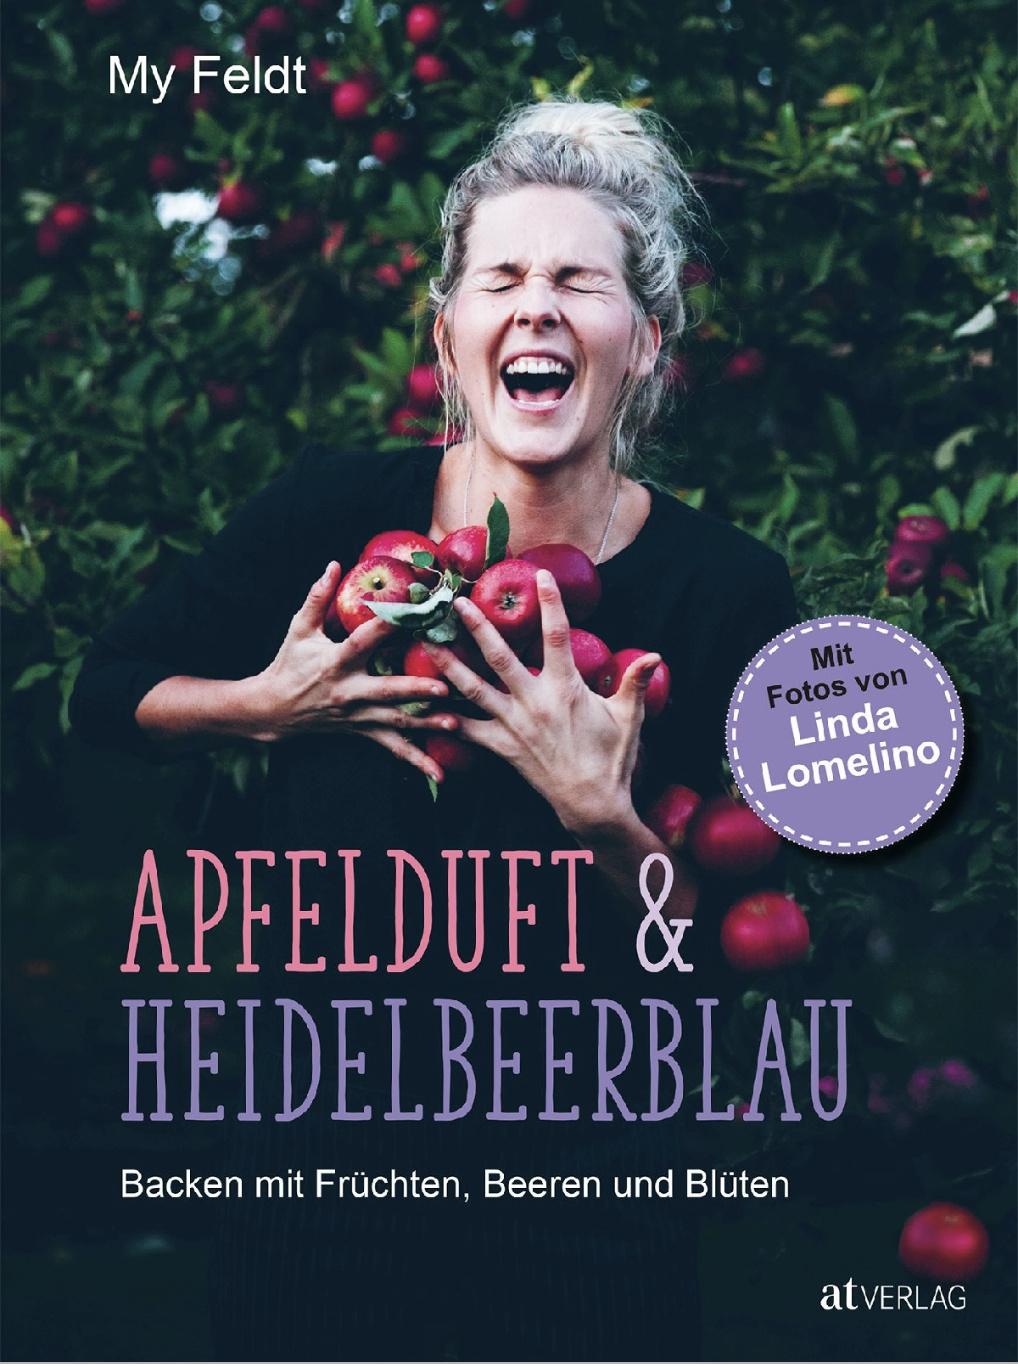 APFELDUFT & HEIDELBEERBLAU  - My Feldt